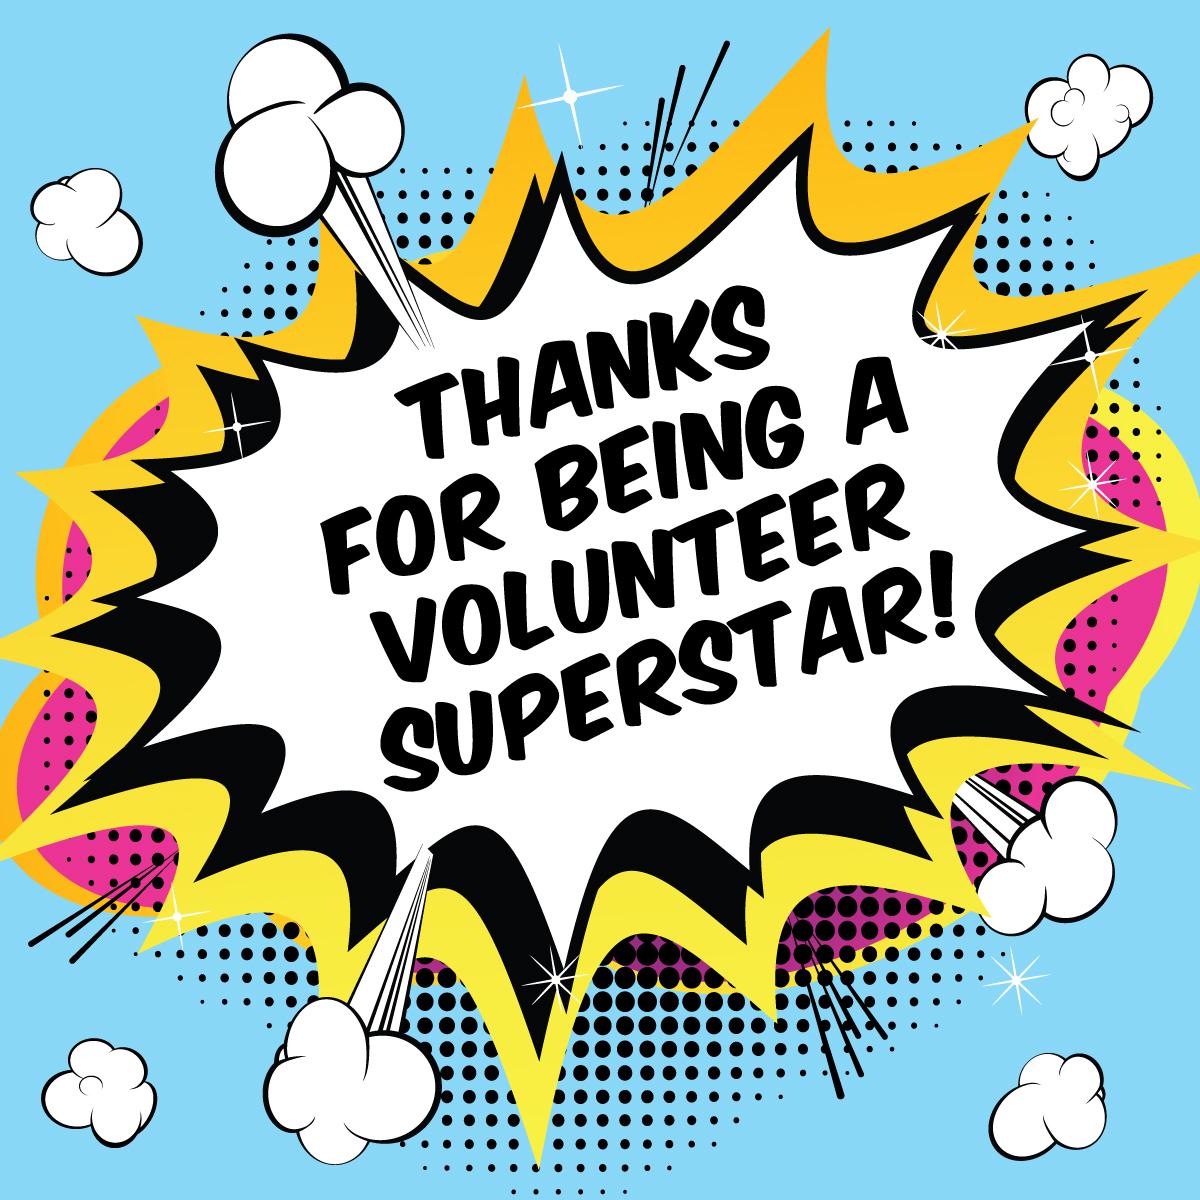 1016_thank_you_volunteer_superstar_fb.jpg